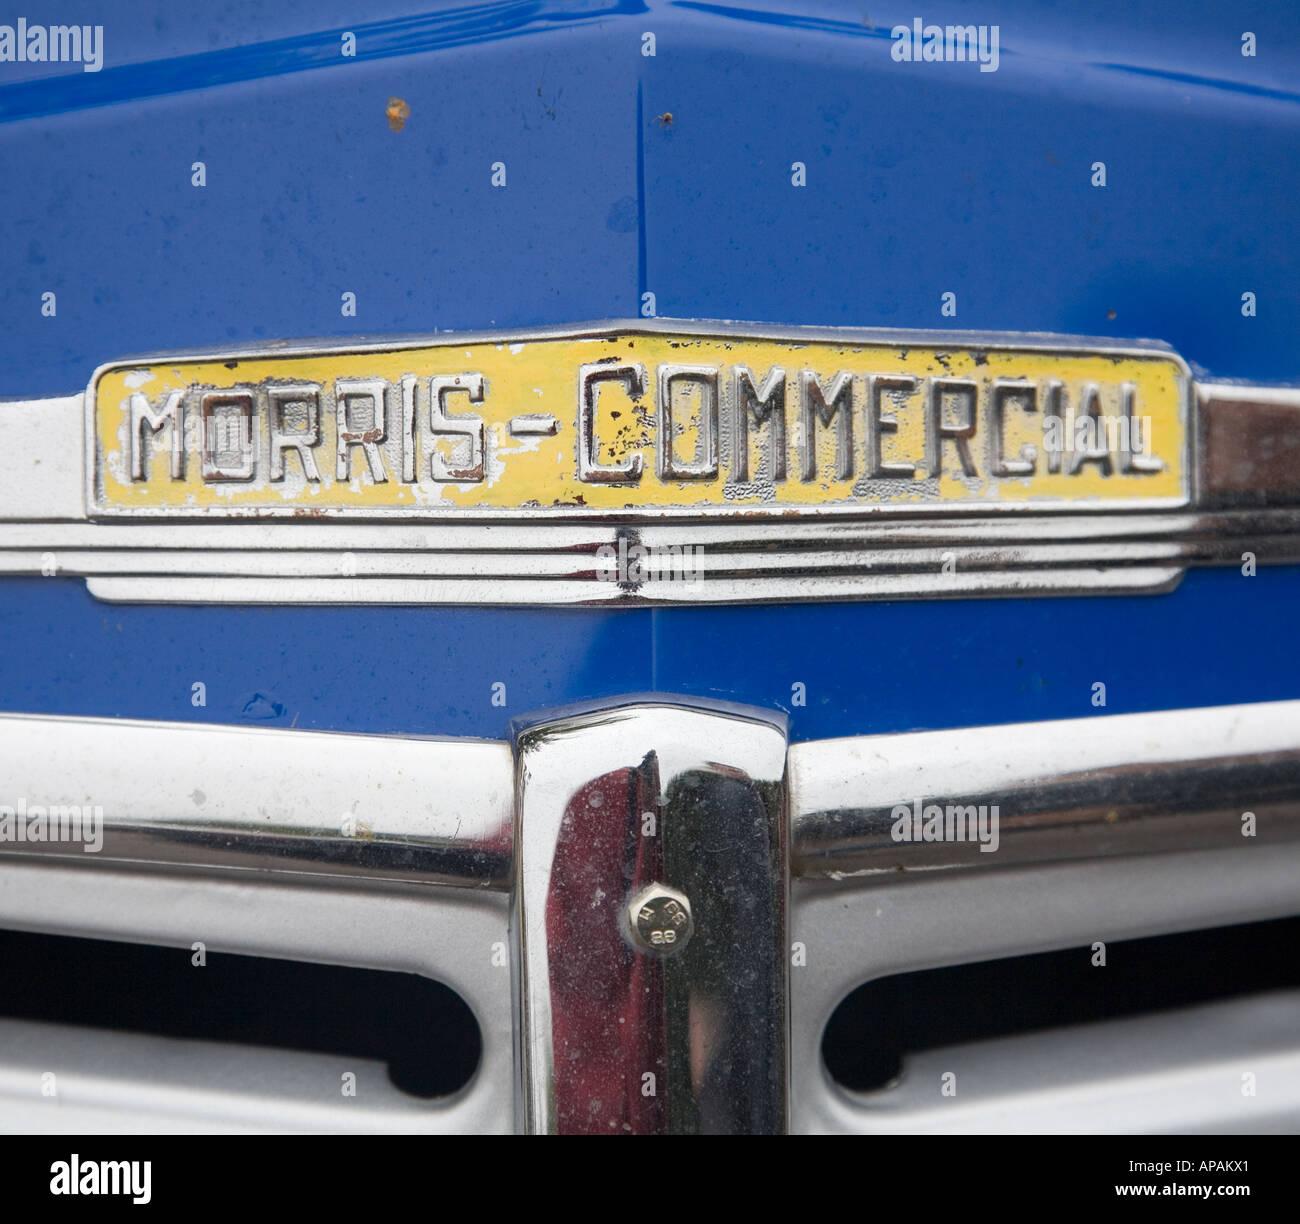 351cad672c317f Morris Commercial Van The Revival Festival Goodwood Sussex UK - Stock Image